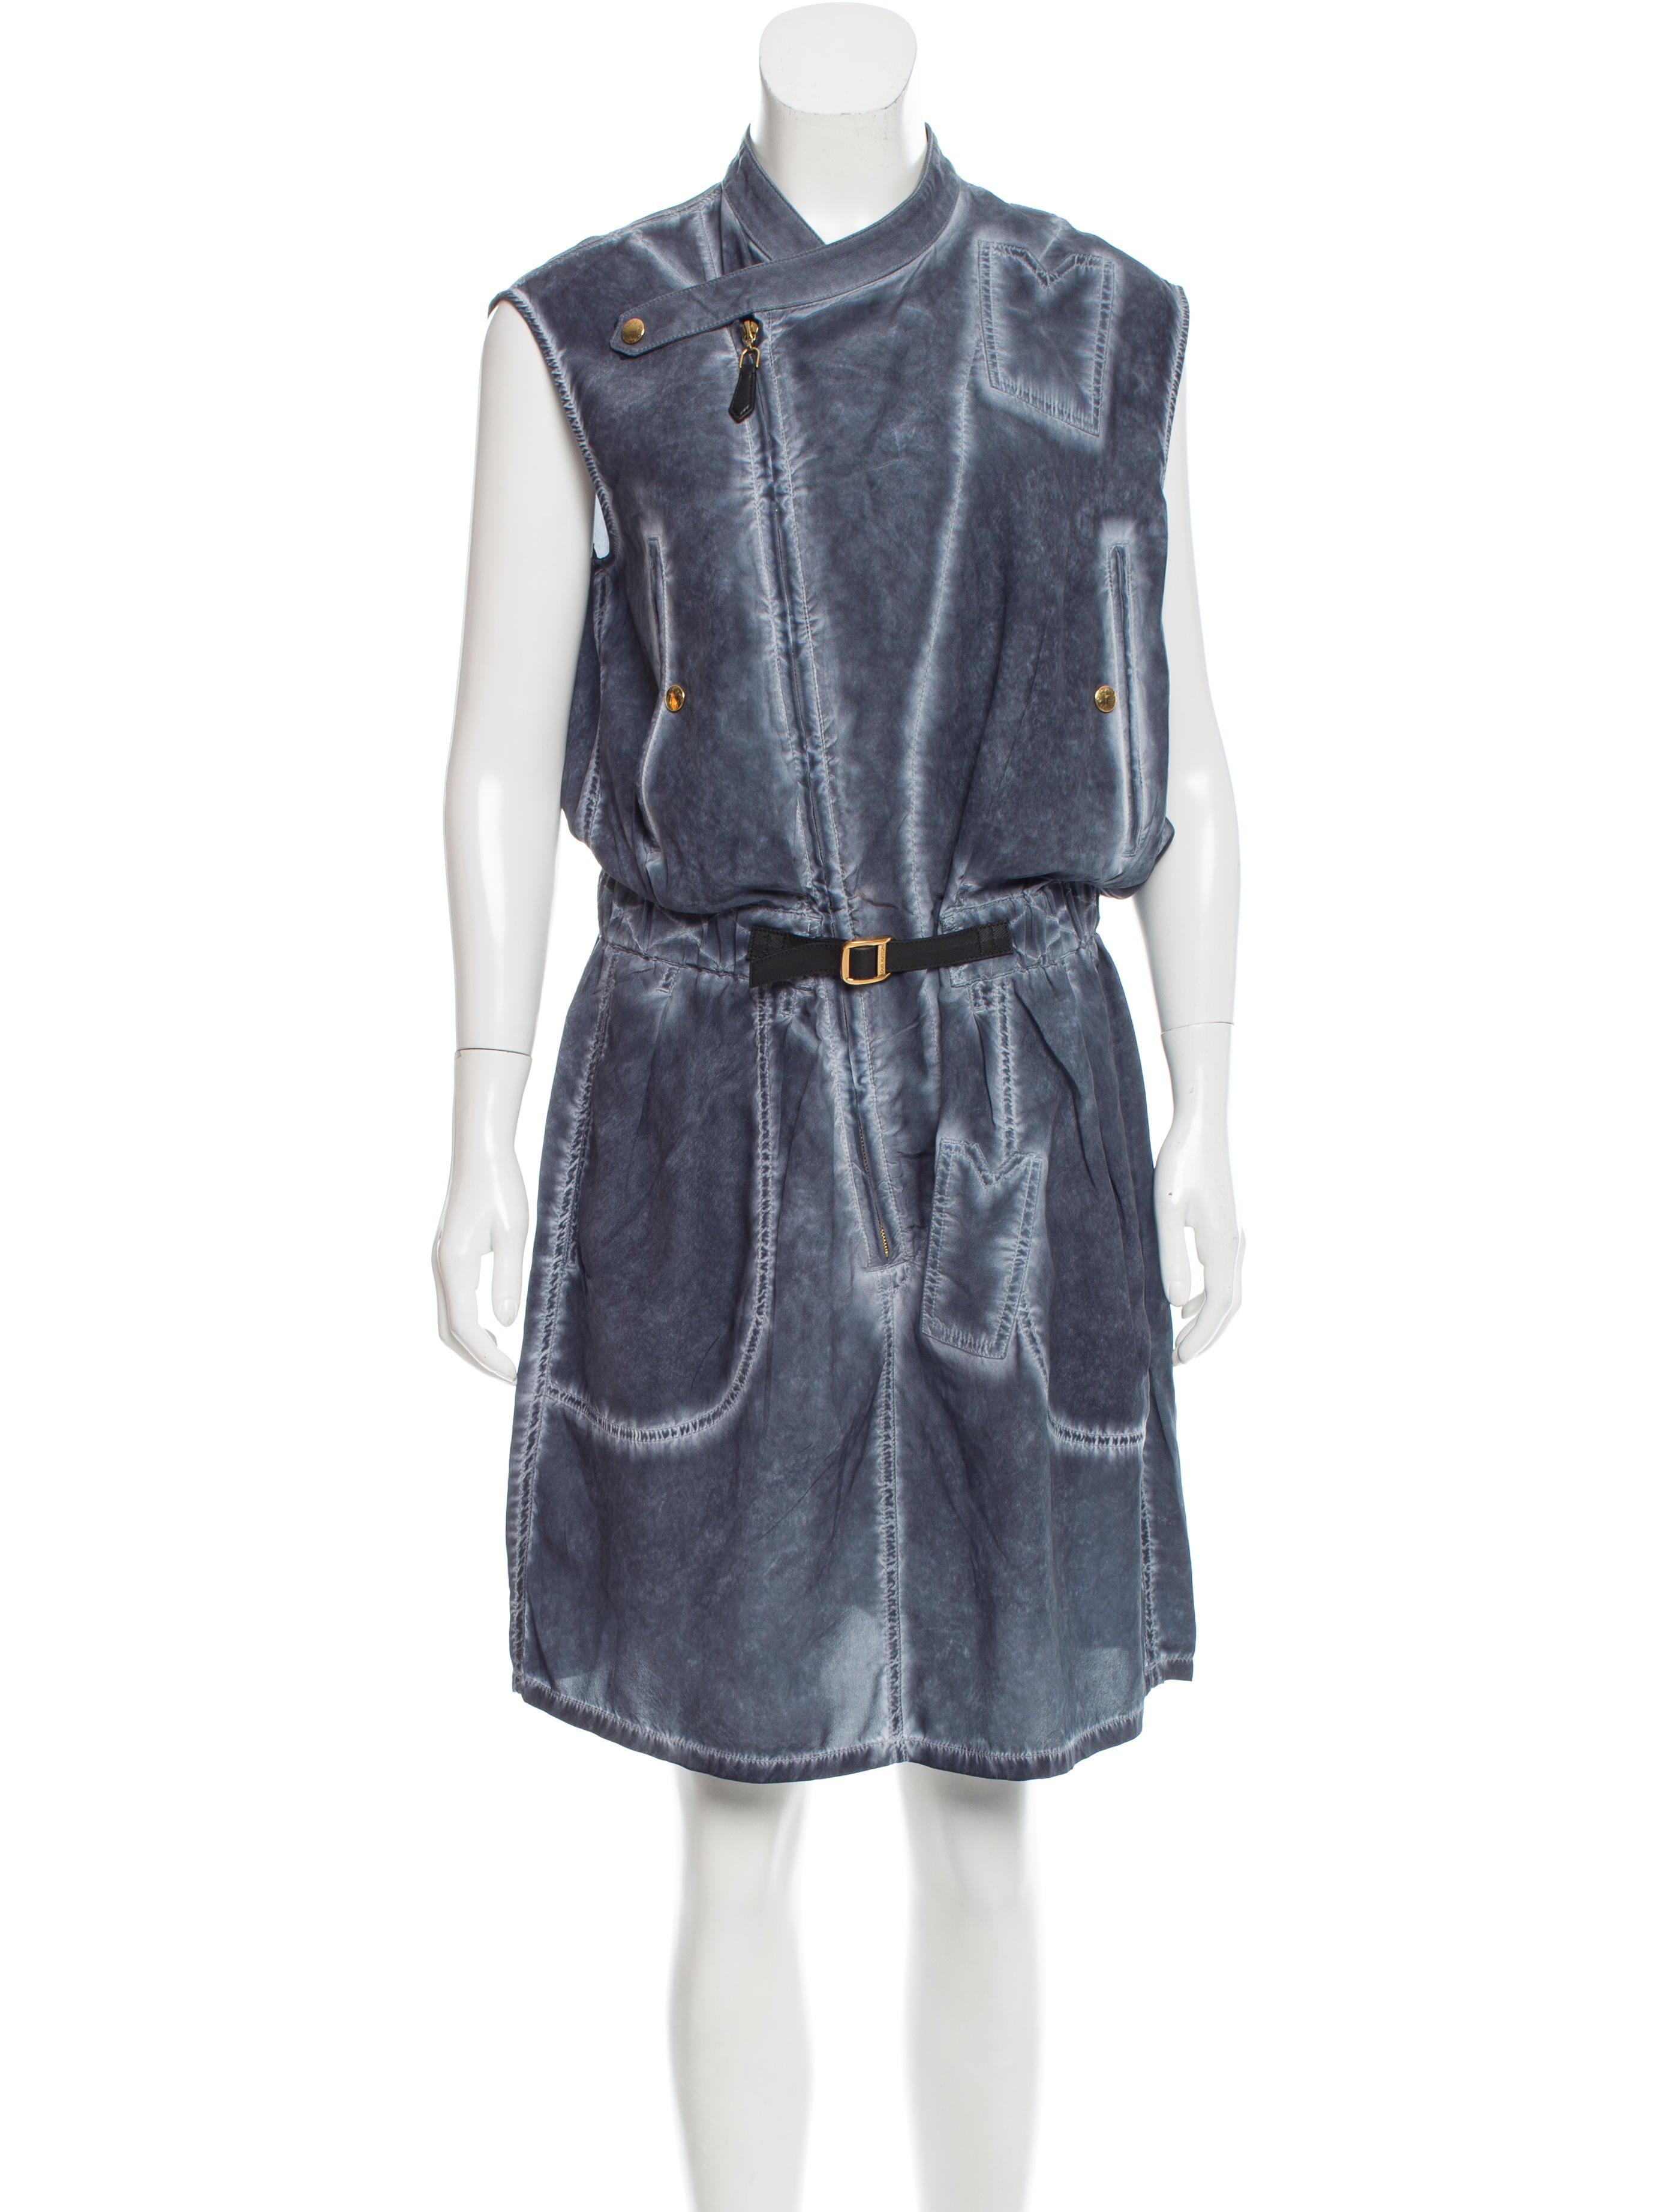 Louis Vuitton 2016 Silk Dress Clothing Lou114360 The